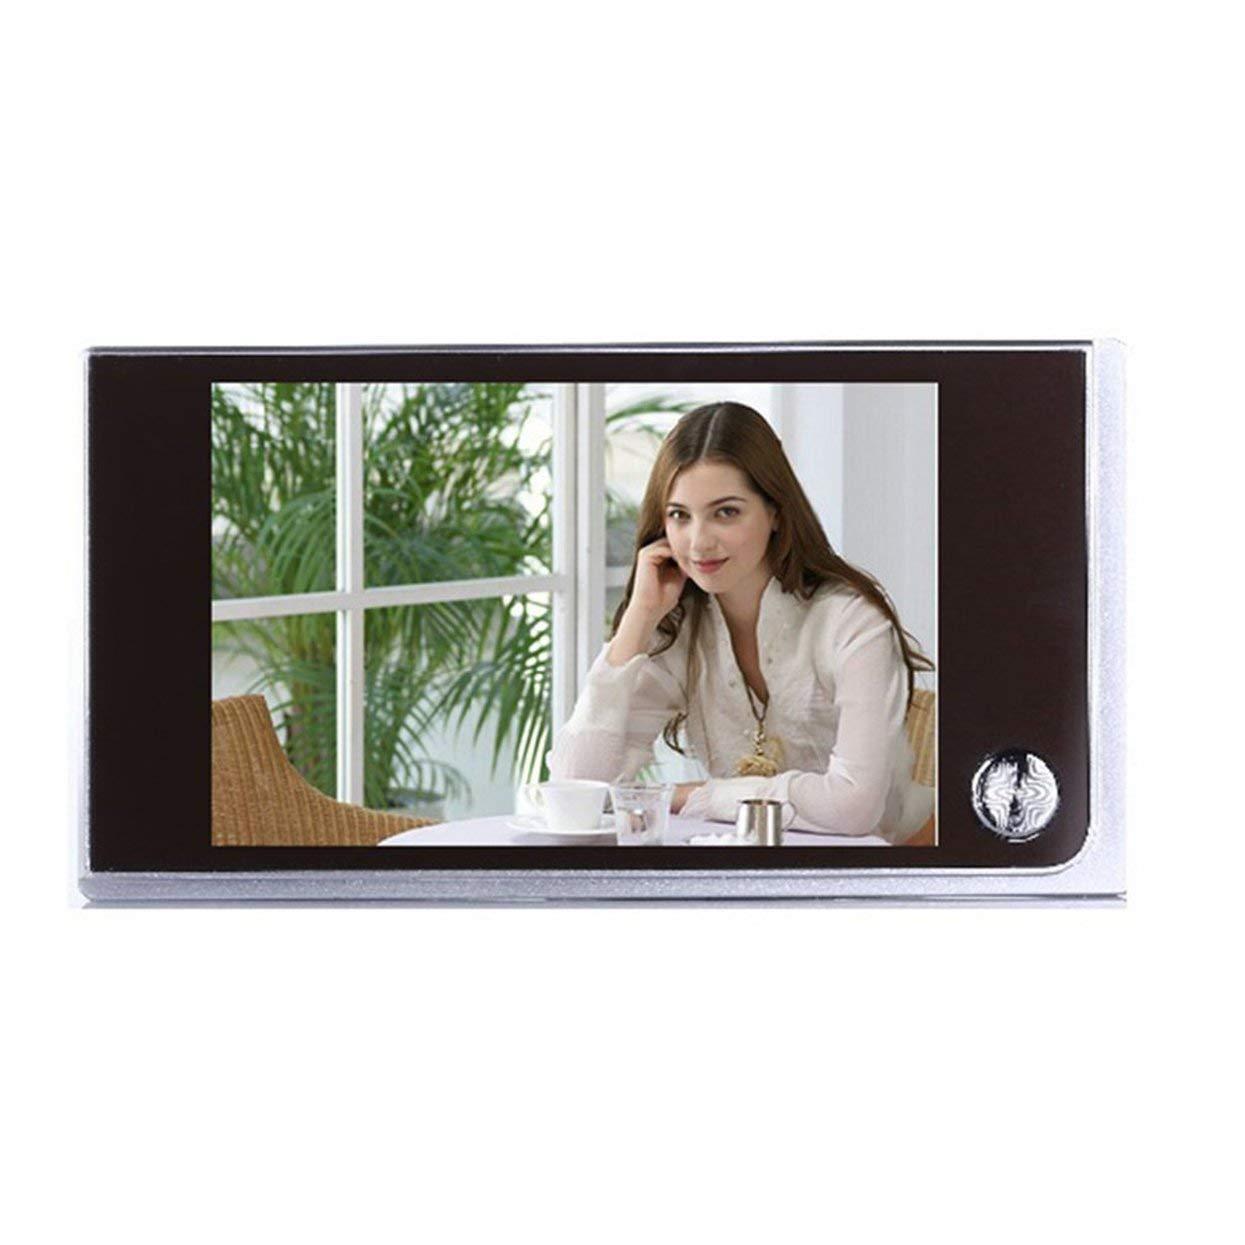 Tree-on-Life Multifunktionale Home Security 3,5-Zoll-LCD-Farb-Digital-TFT-Speicher T/ürspion Viewer T/ürklingel /Überwachungskamera